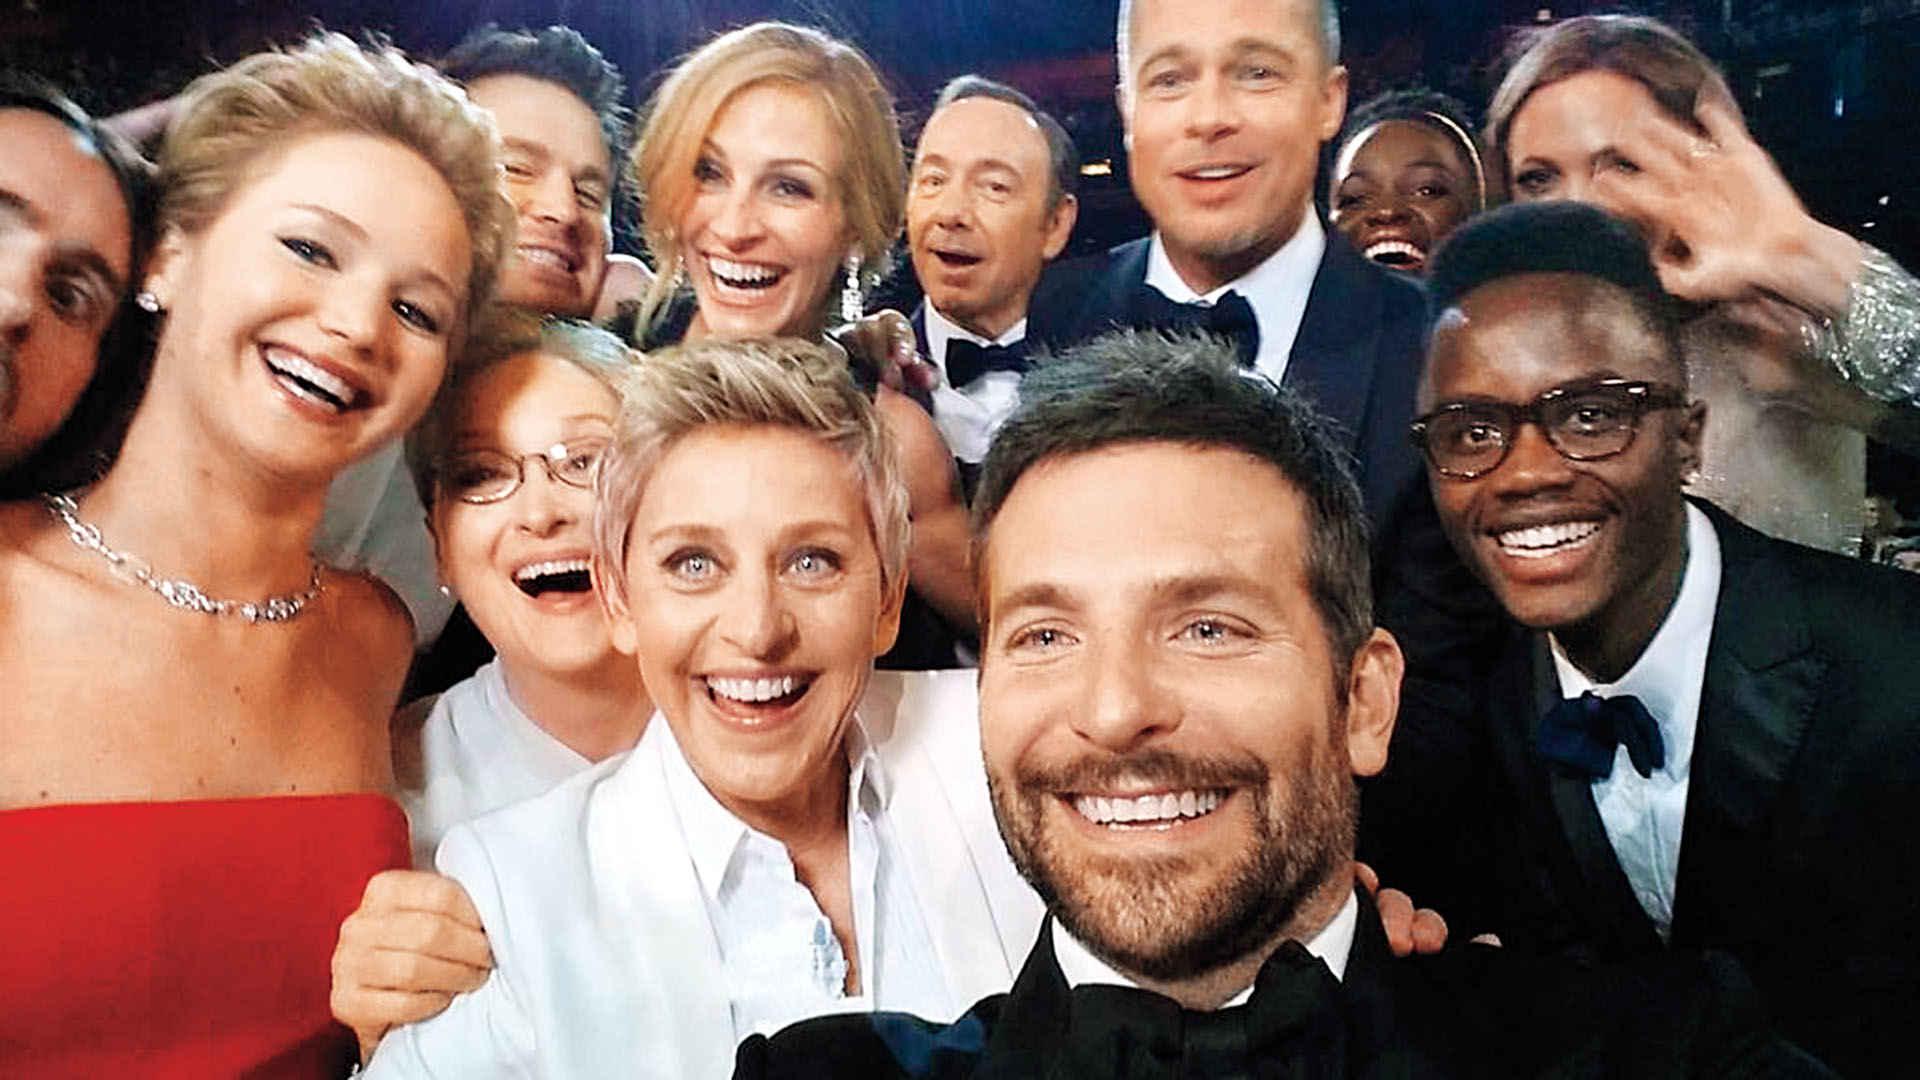 5. Оскар селфи, Бредли Купер, 2014.